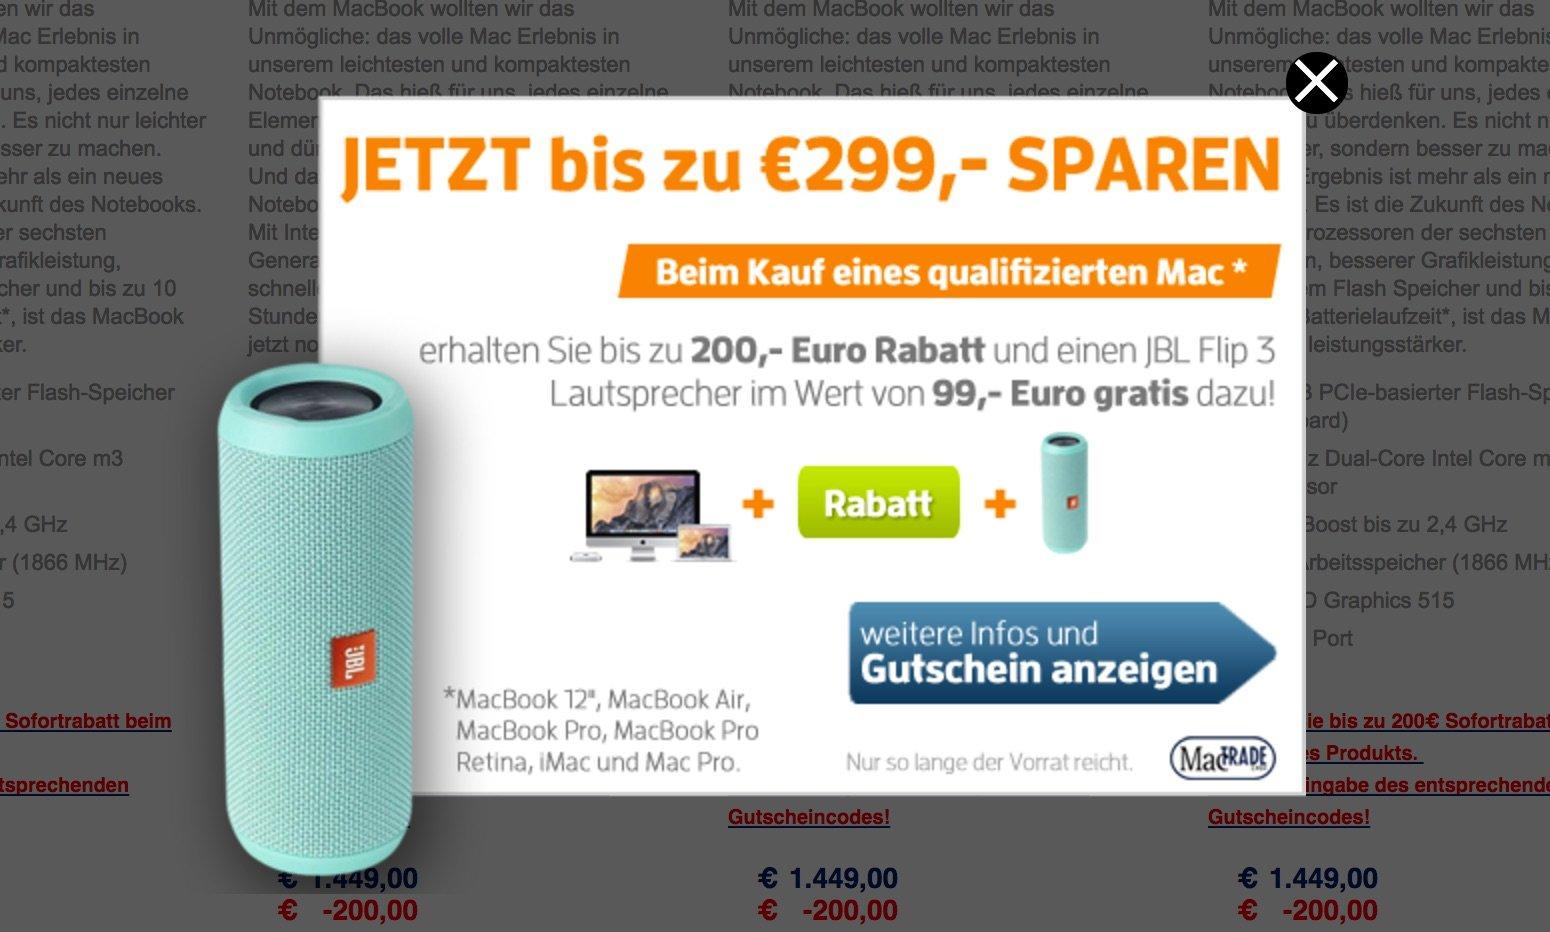 Apple MacBook Pro billiger kaufen: bis zu 299€ Rabatt bei MacTrade 12